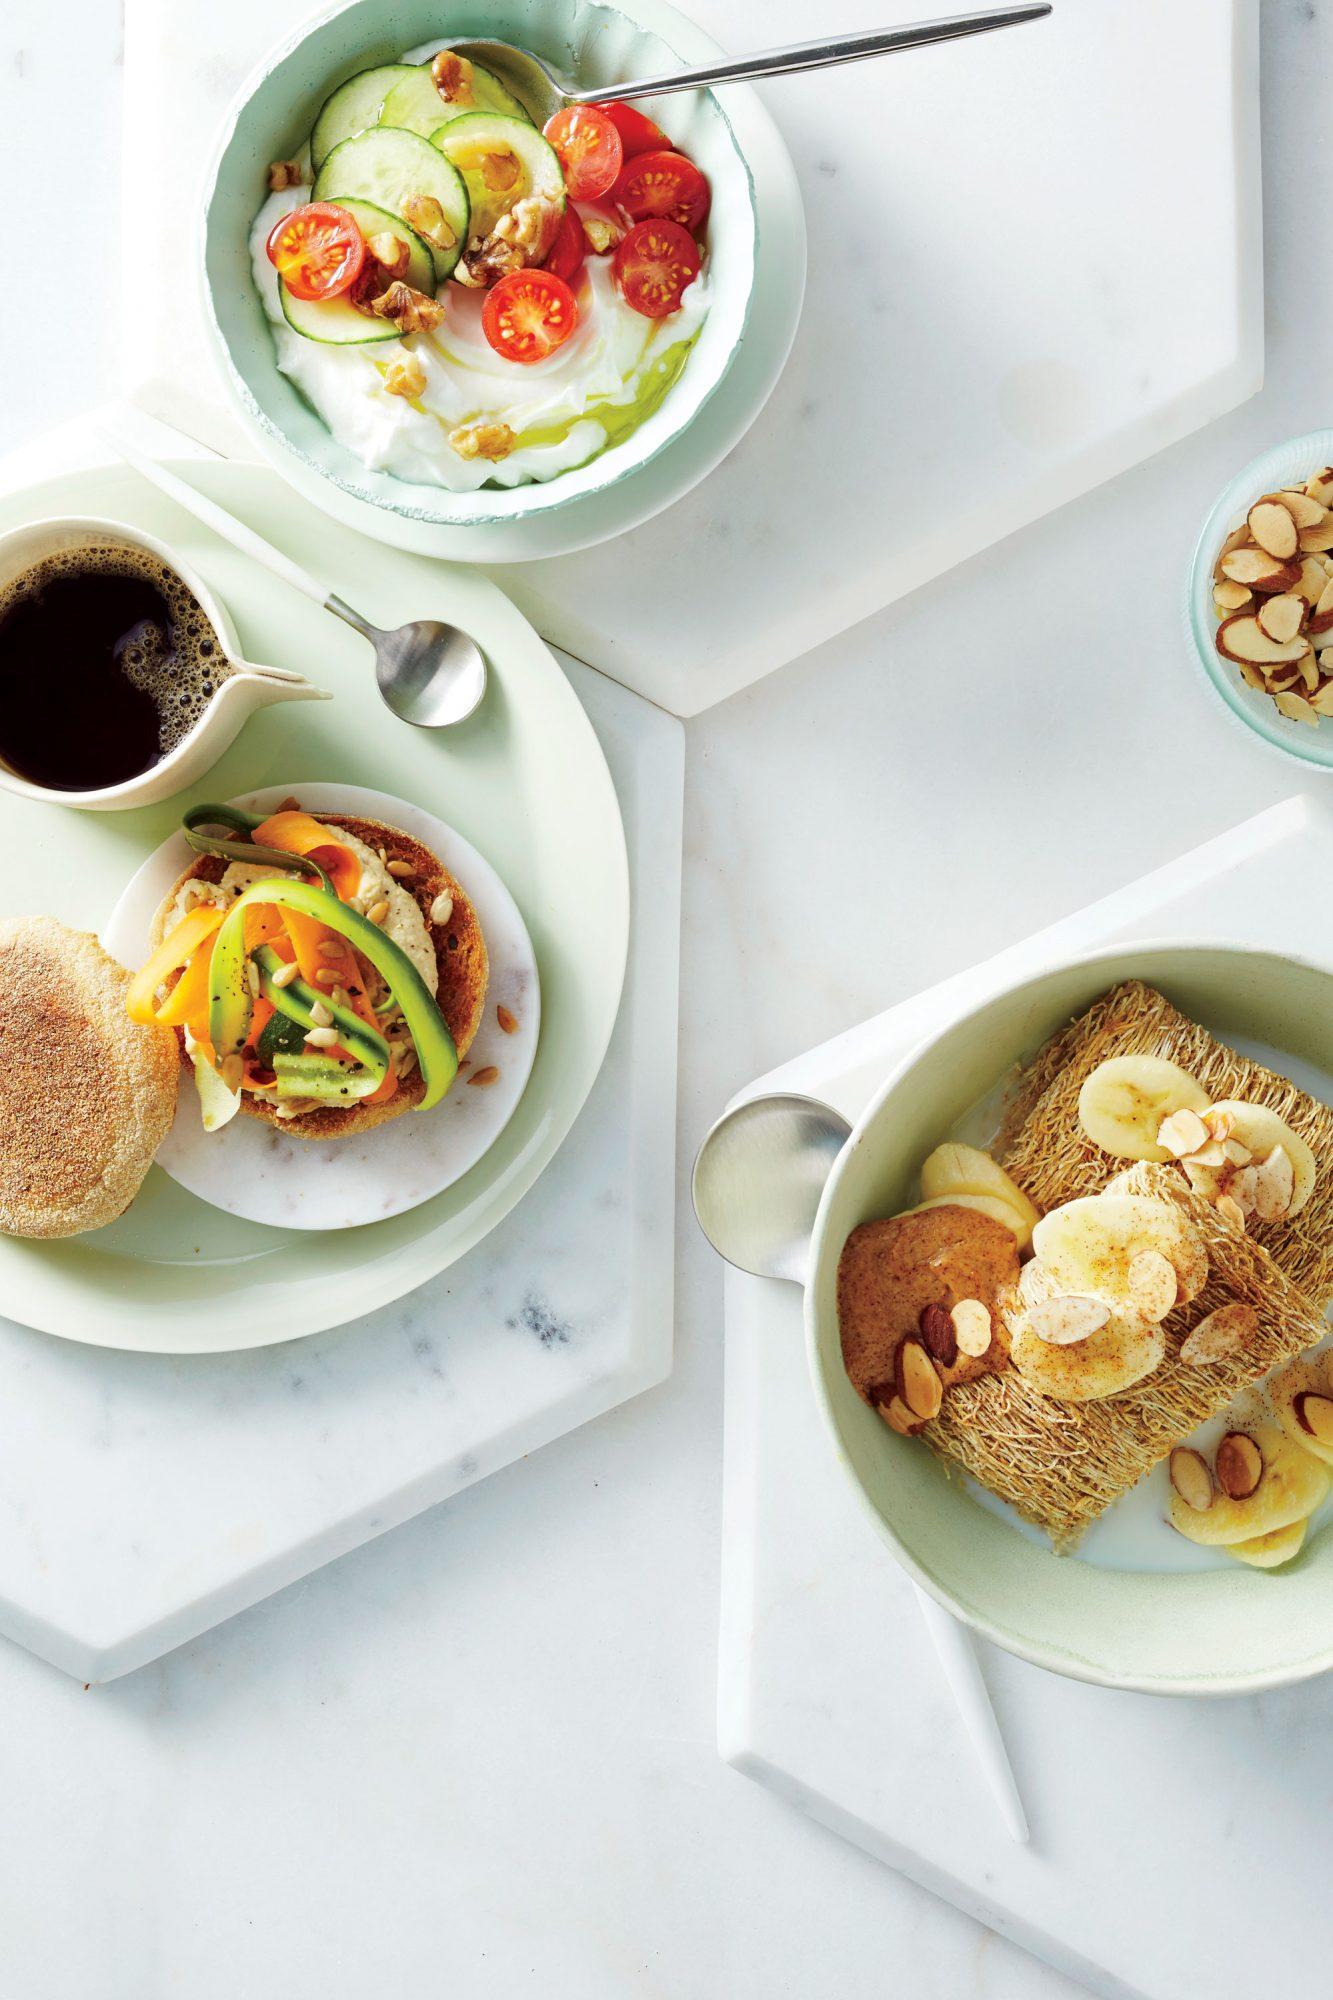 Hummus-Zucchini English Muffin image